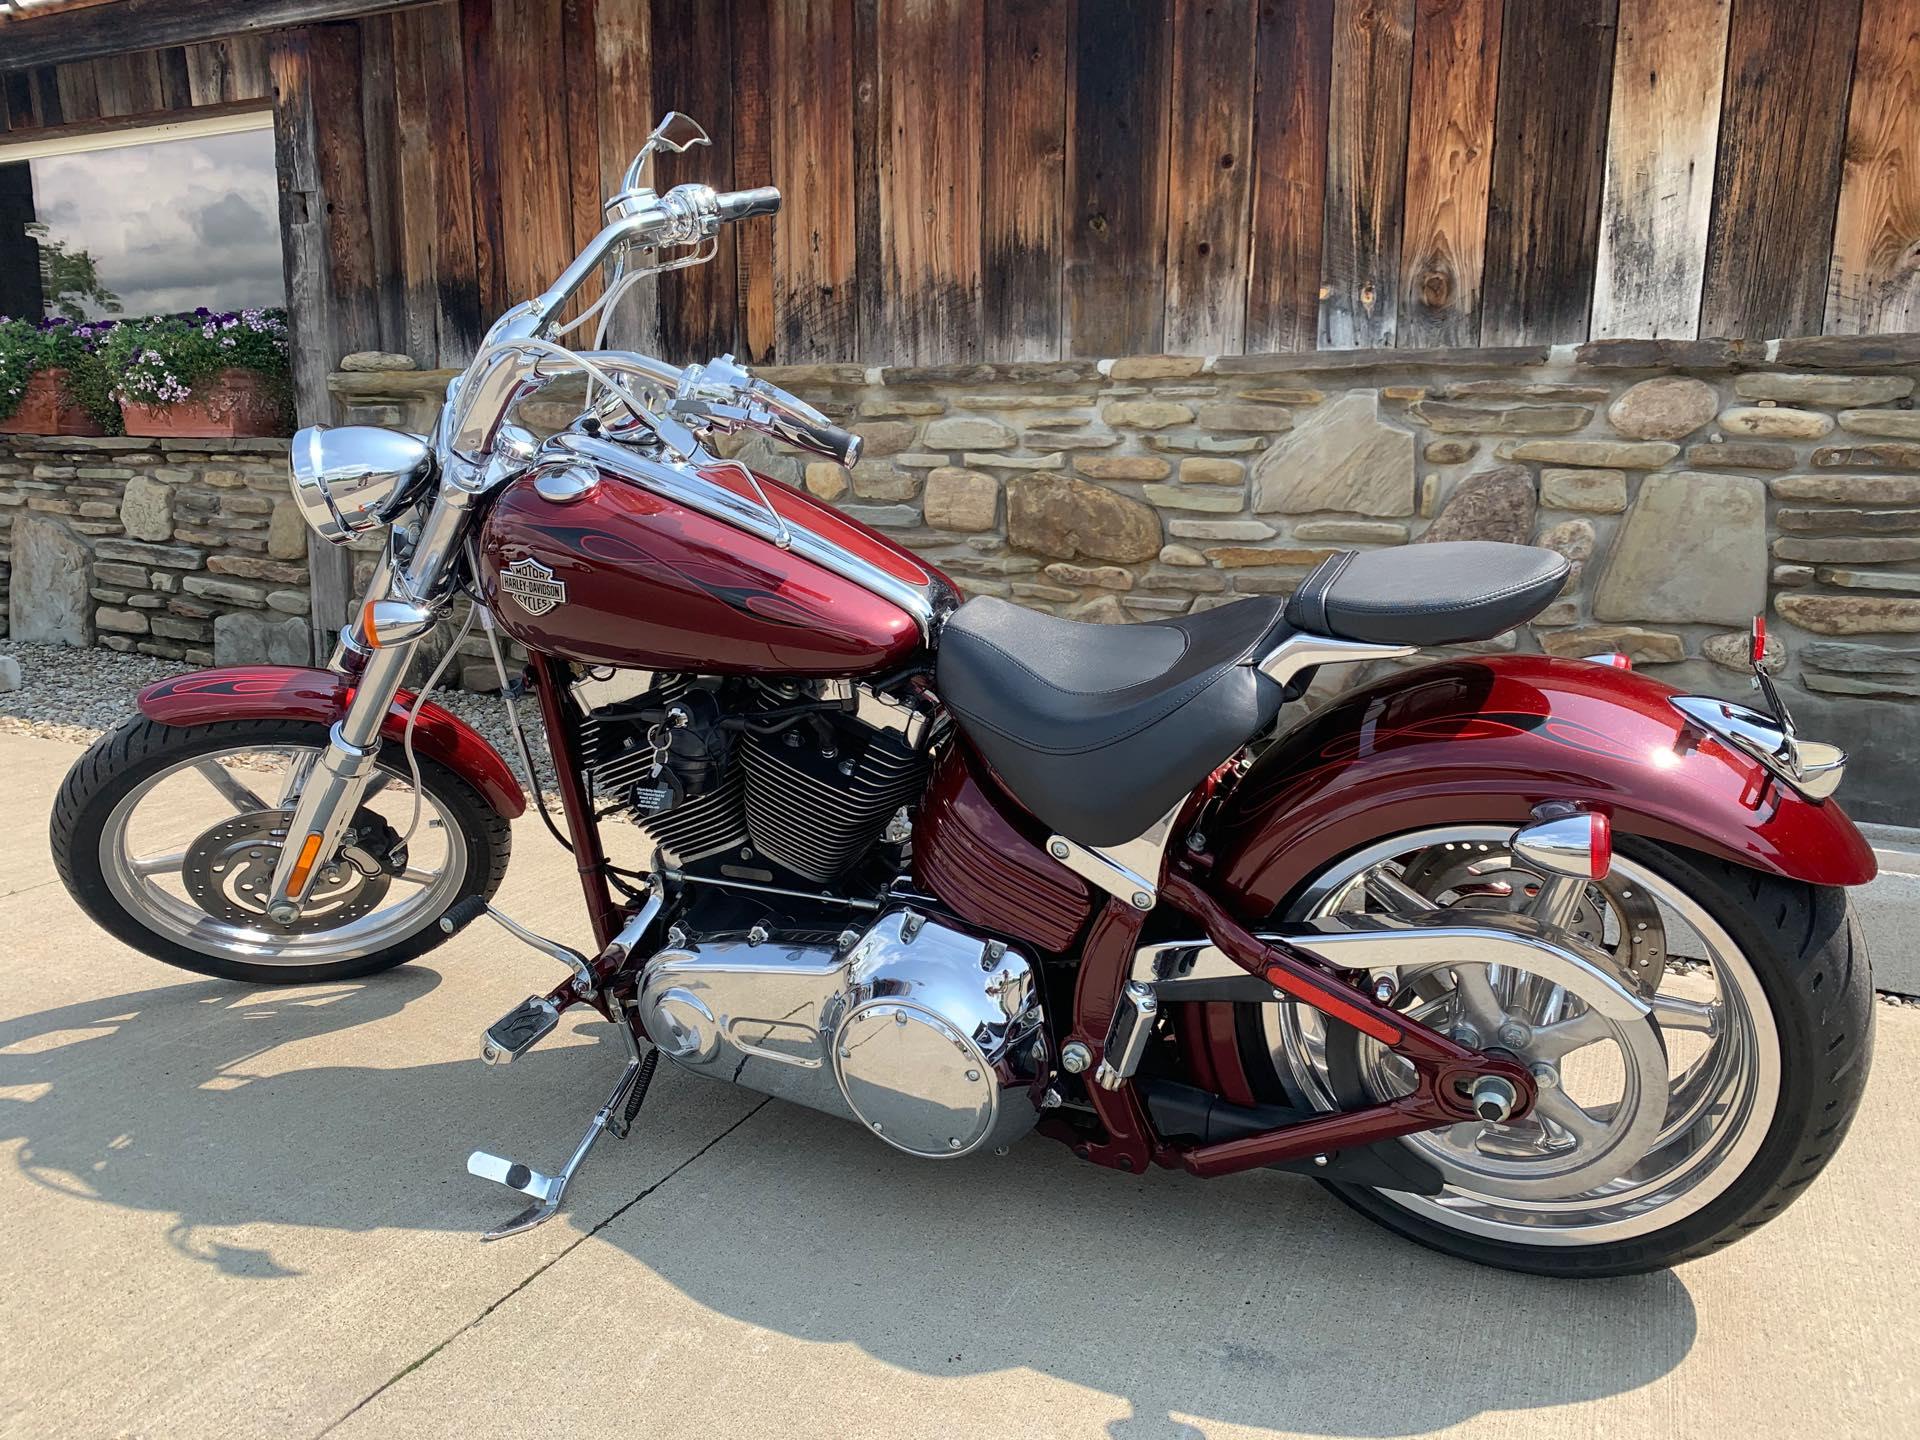 2009 Harley-Davidson Softail Rocker C at Arkport Cycles